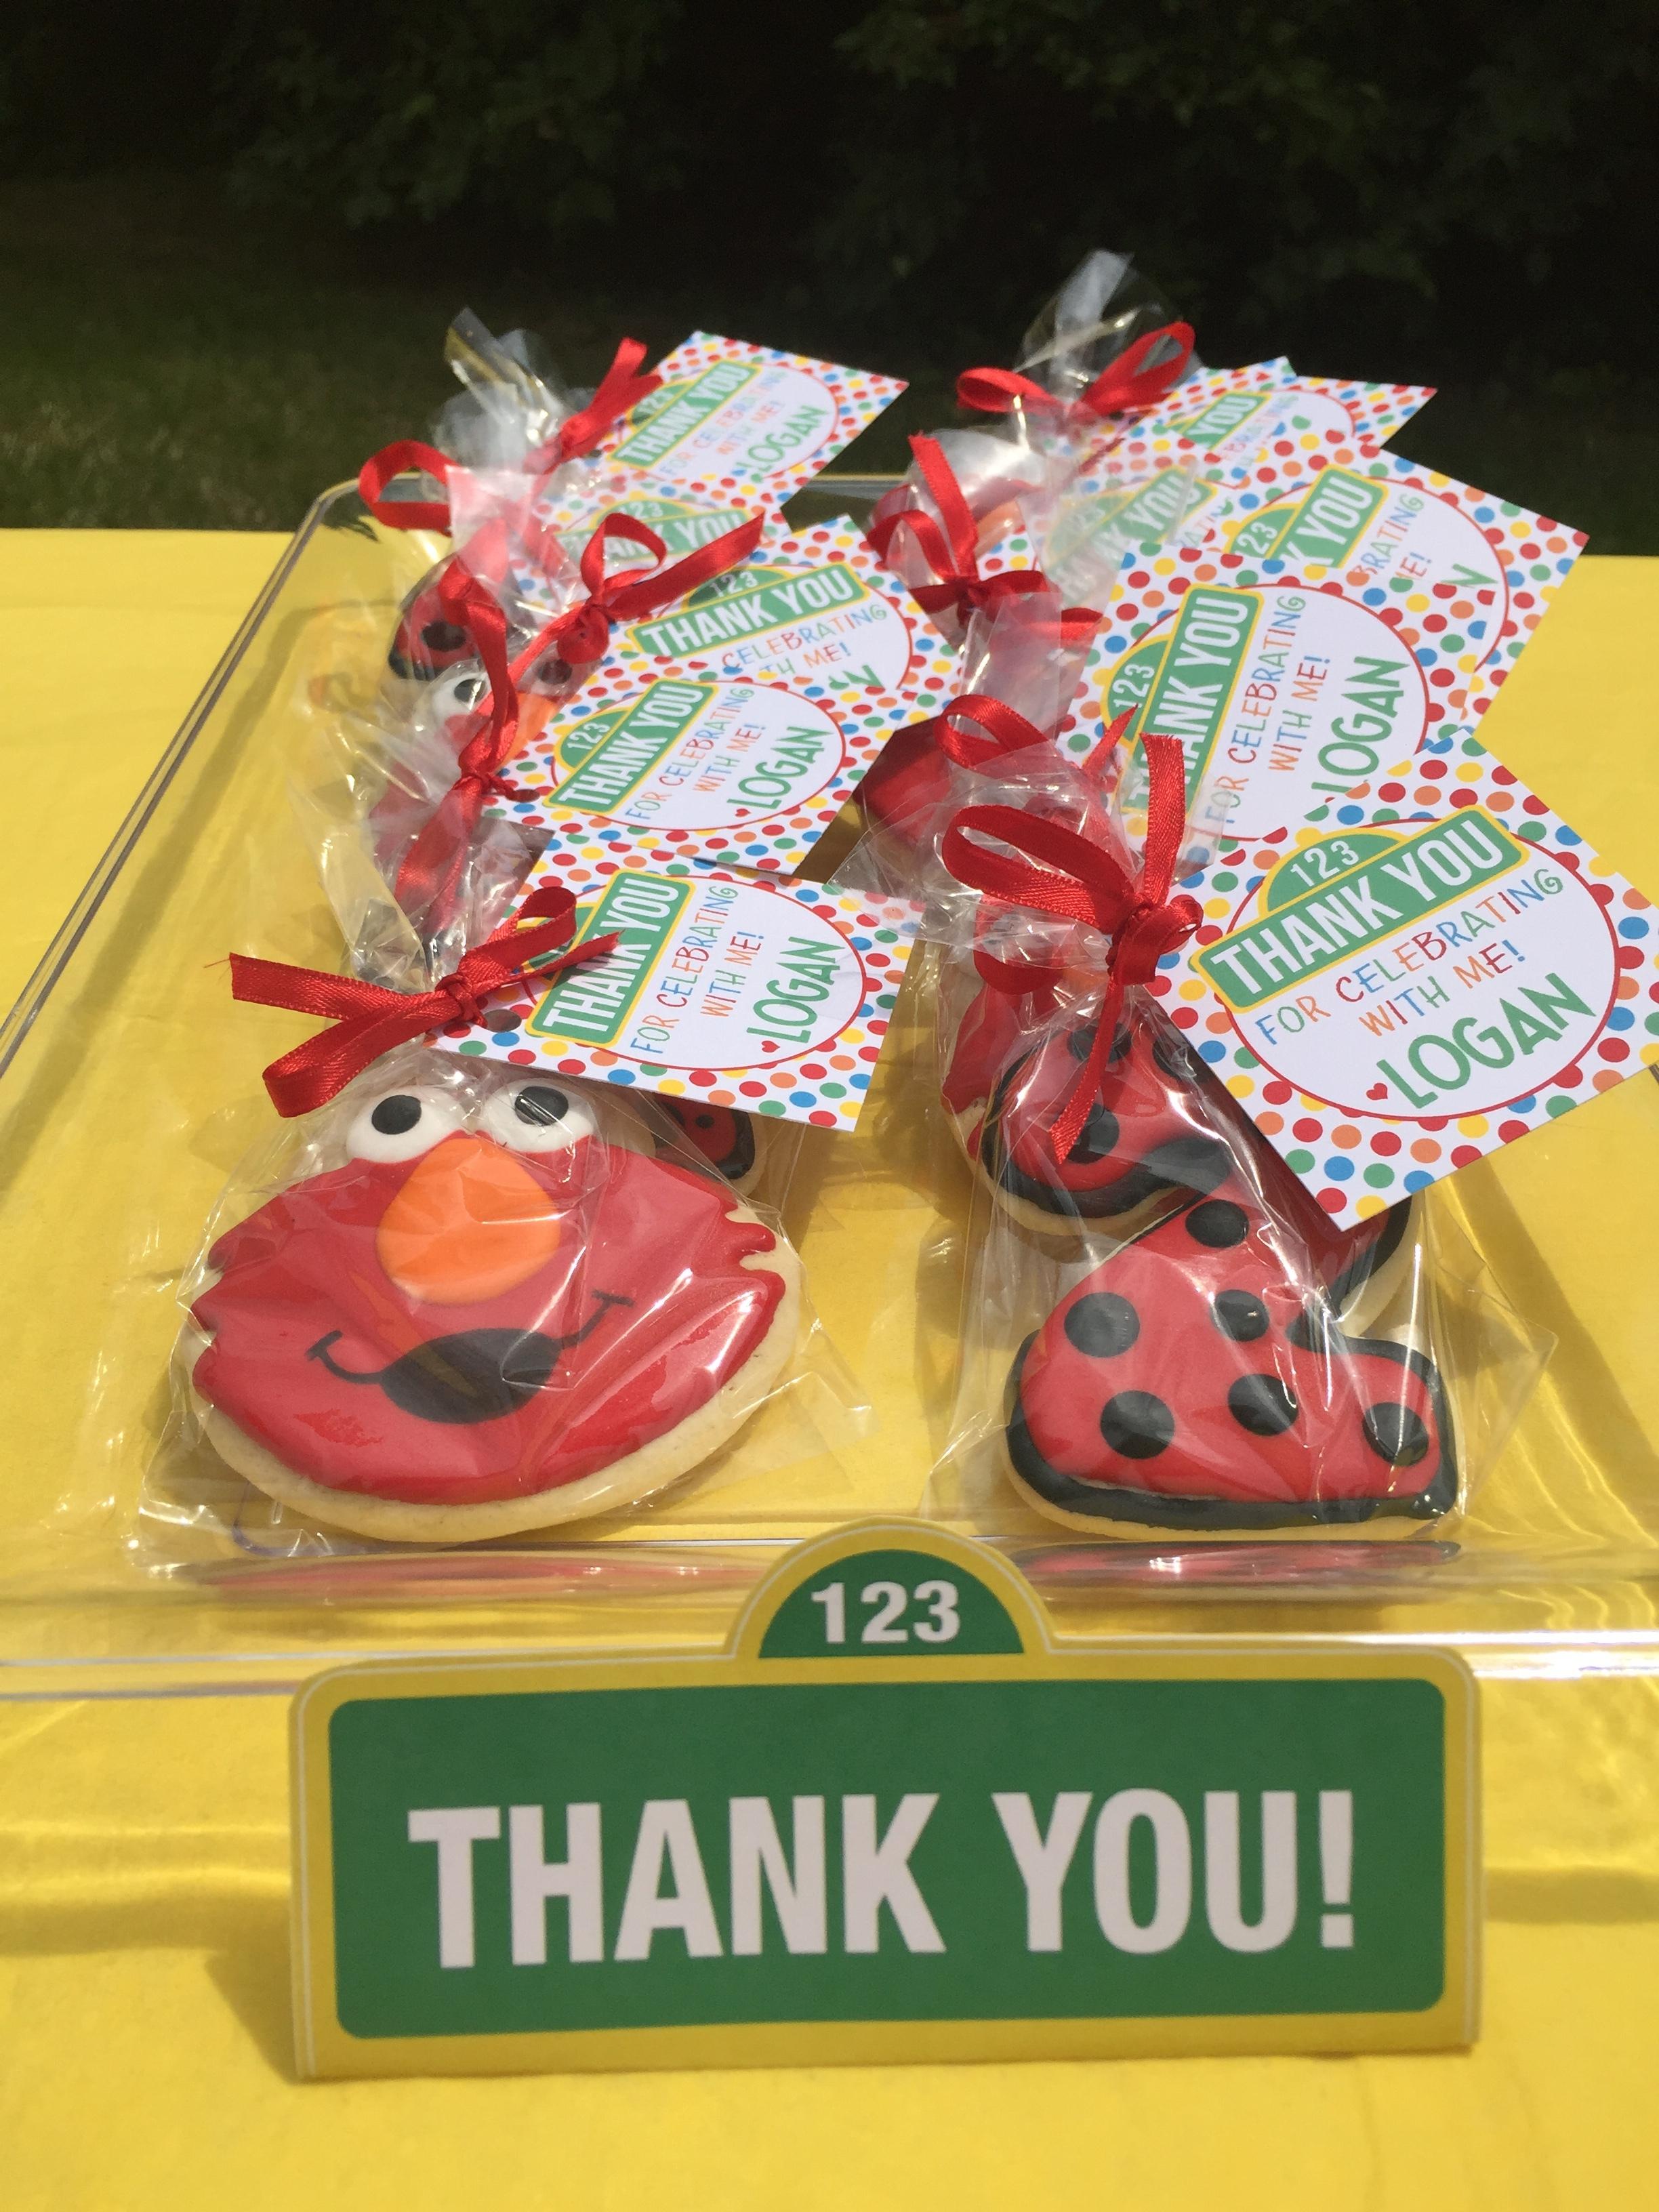 "img src=""httpwww.theparkwayevents.jpg"" alt=""San Francisco Bay Area Event Planner Sesame Street Elmo Birthday Party Favors"".JPG"